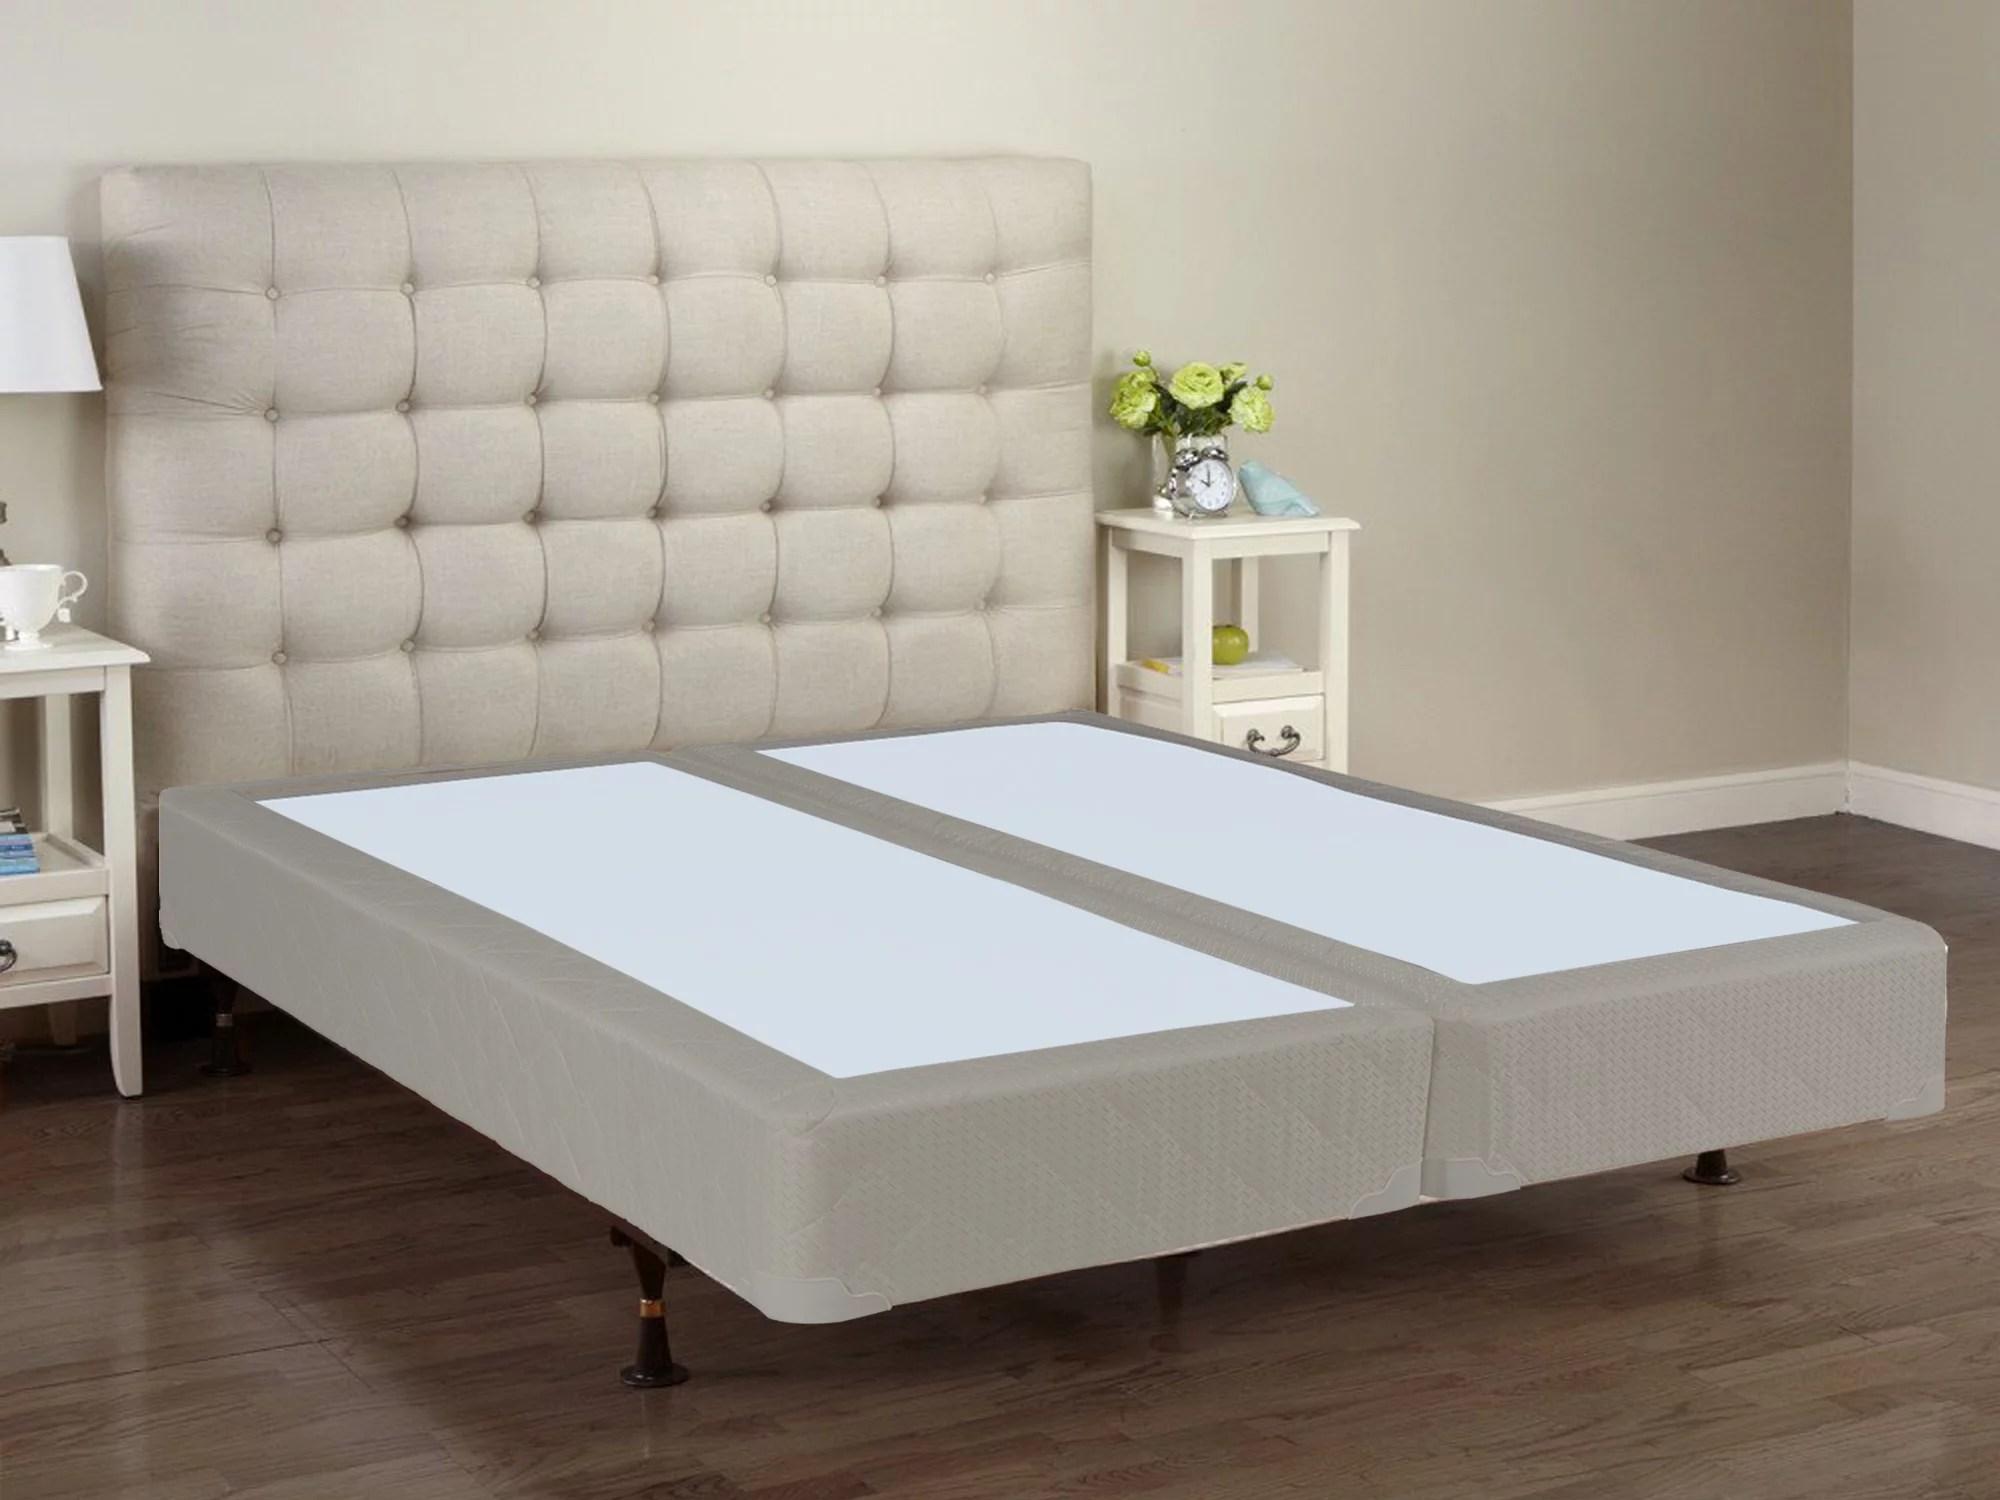 wayton 8 assembled split wood box spring foundation for mattress full size walmart com